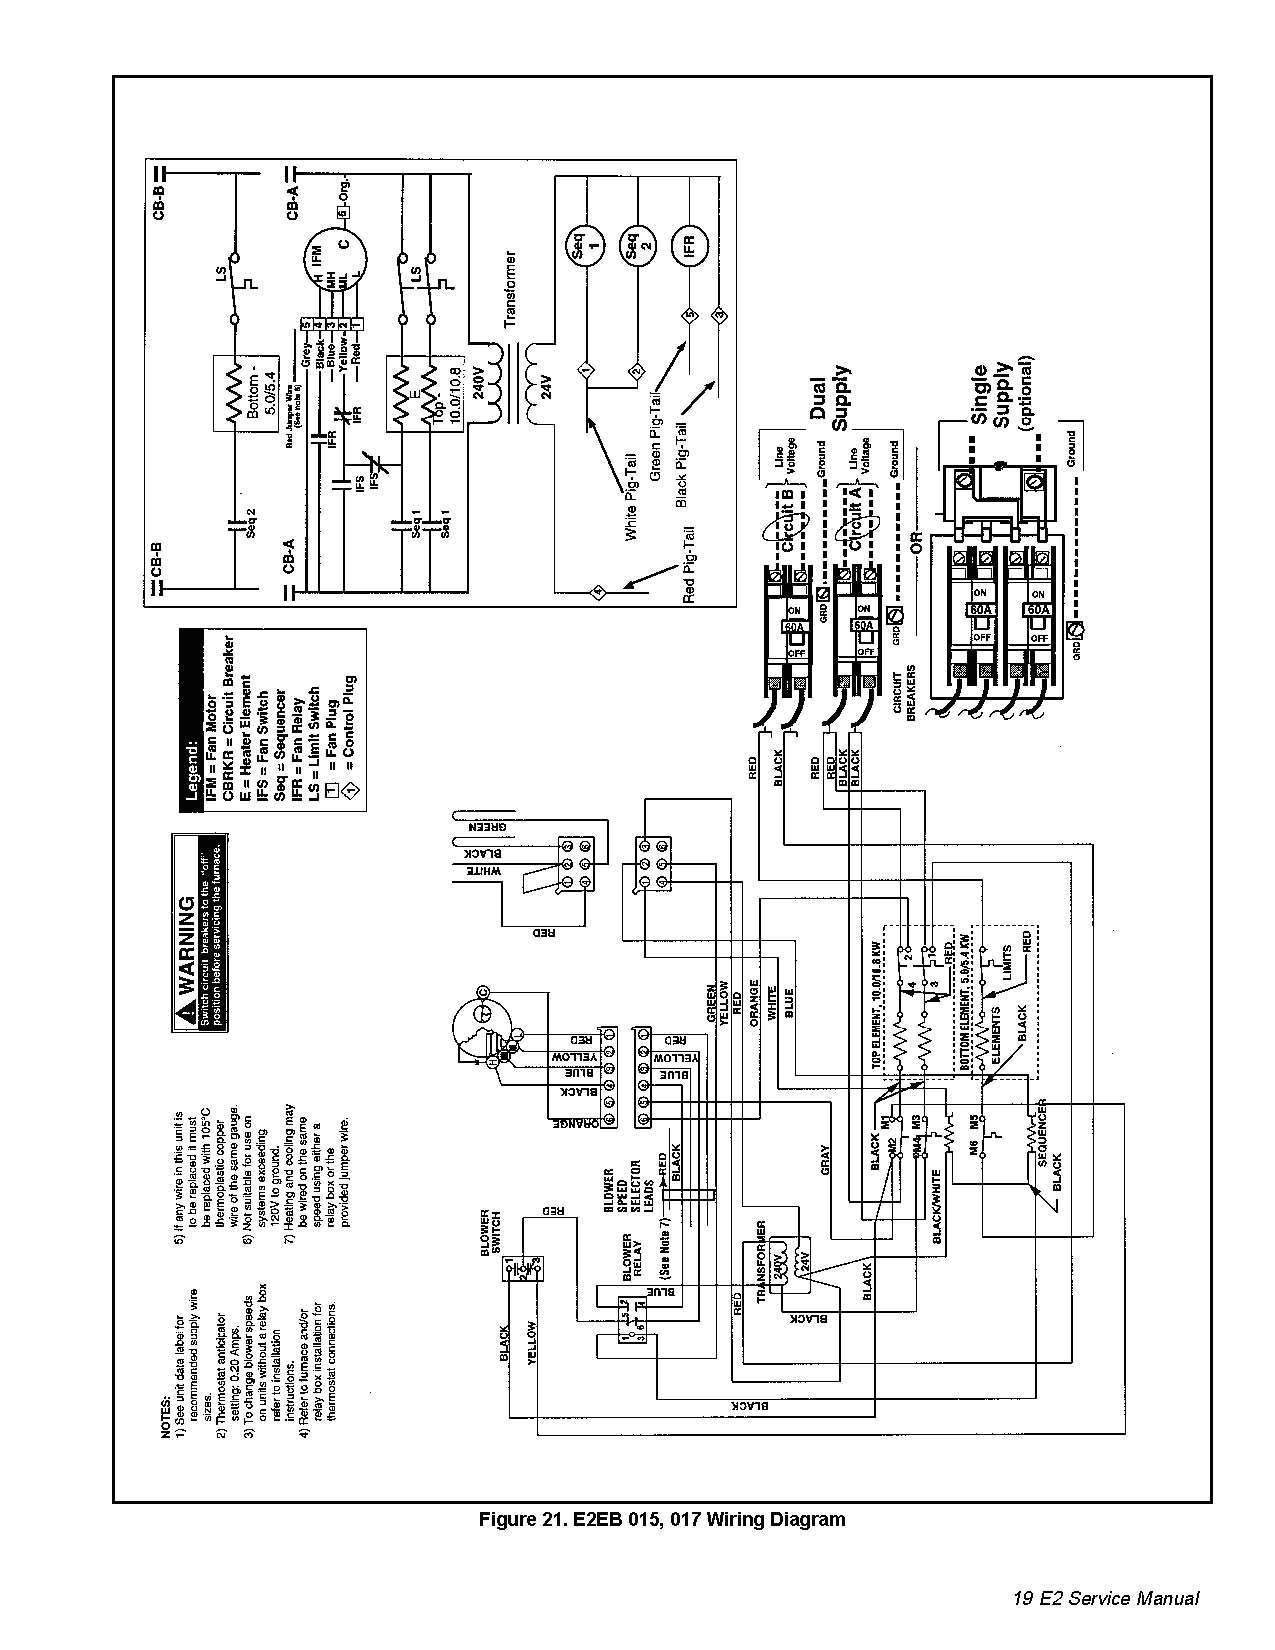 e1eb 015ha wiring diagram wiring diagrams terms nordyne e1eb 015ha wiring diagram e1eb 015ha wiring diagram